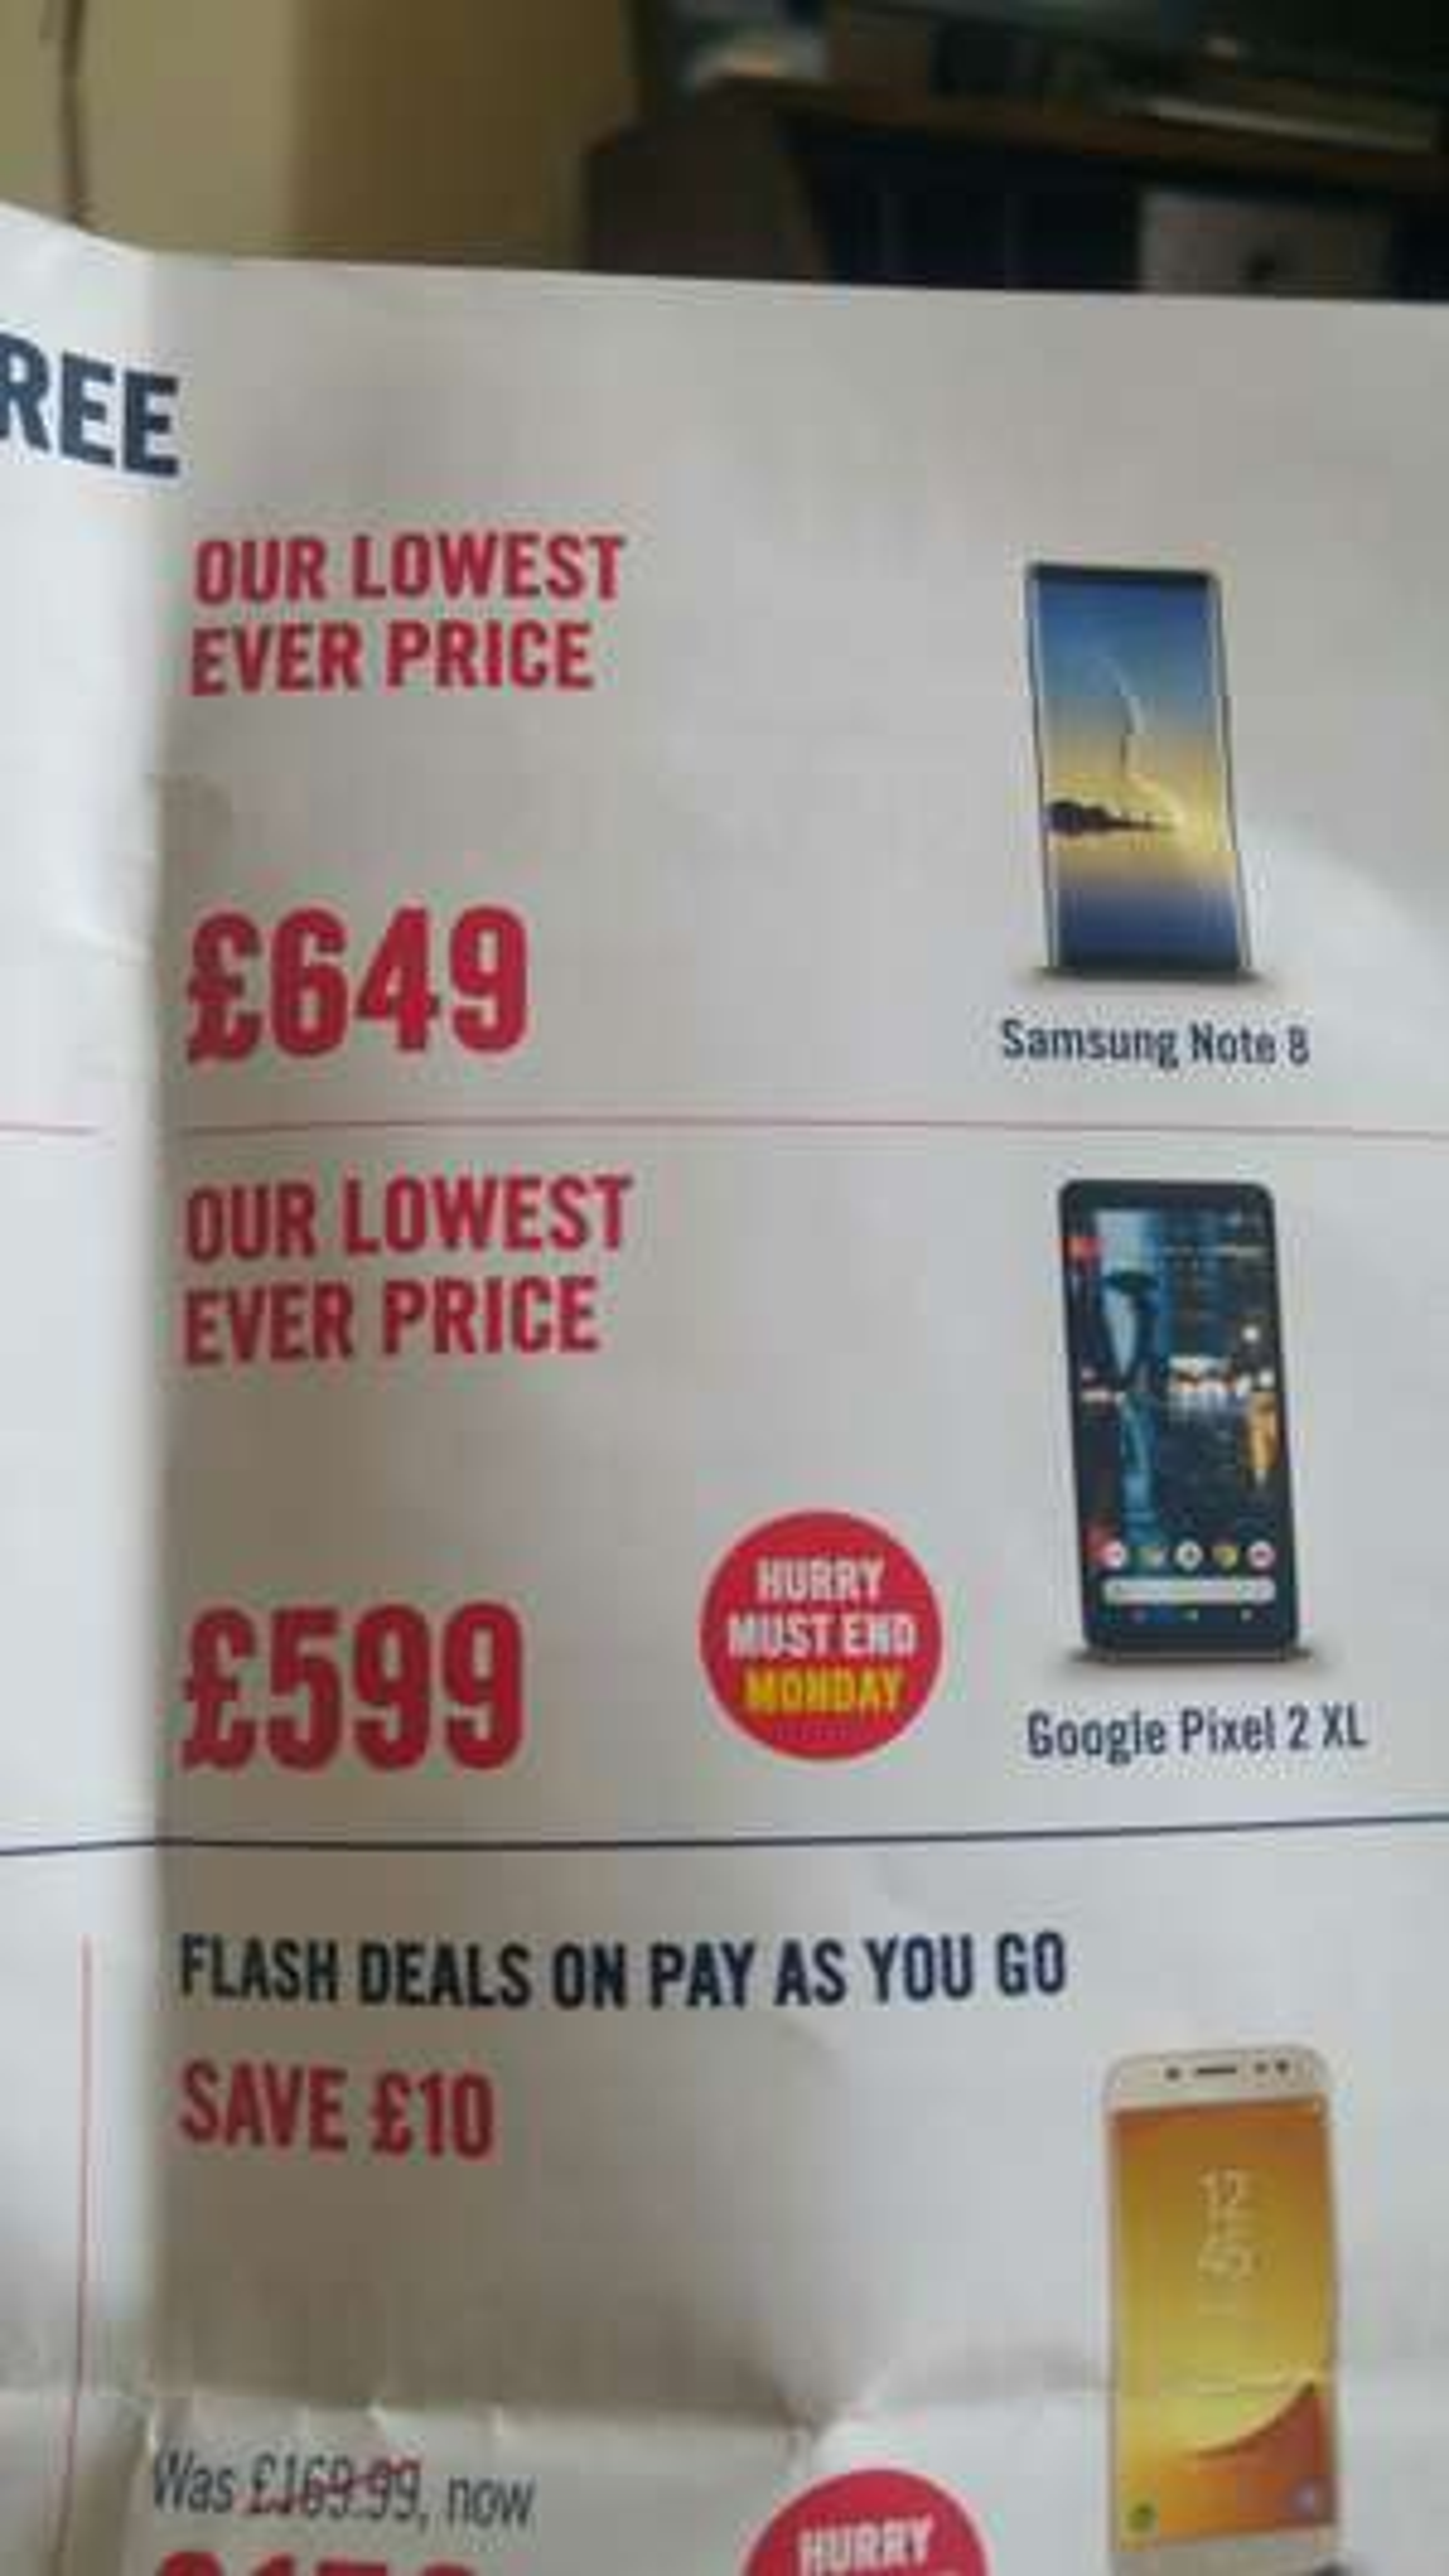 Google Pixel 2 XL £599 @ Carphone Warehouse